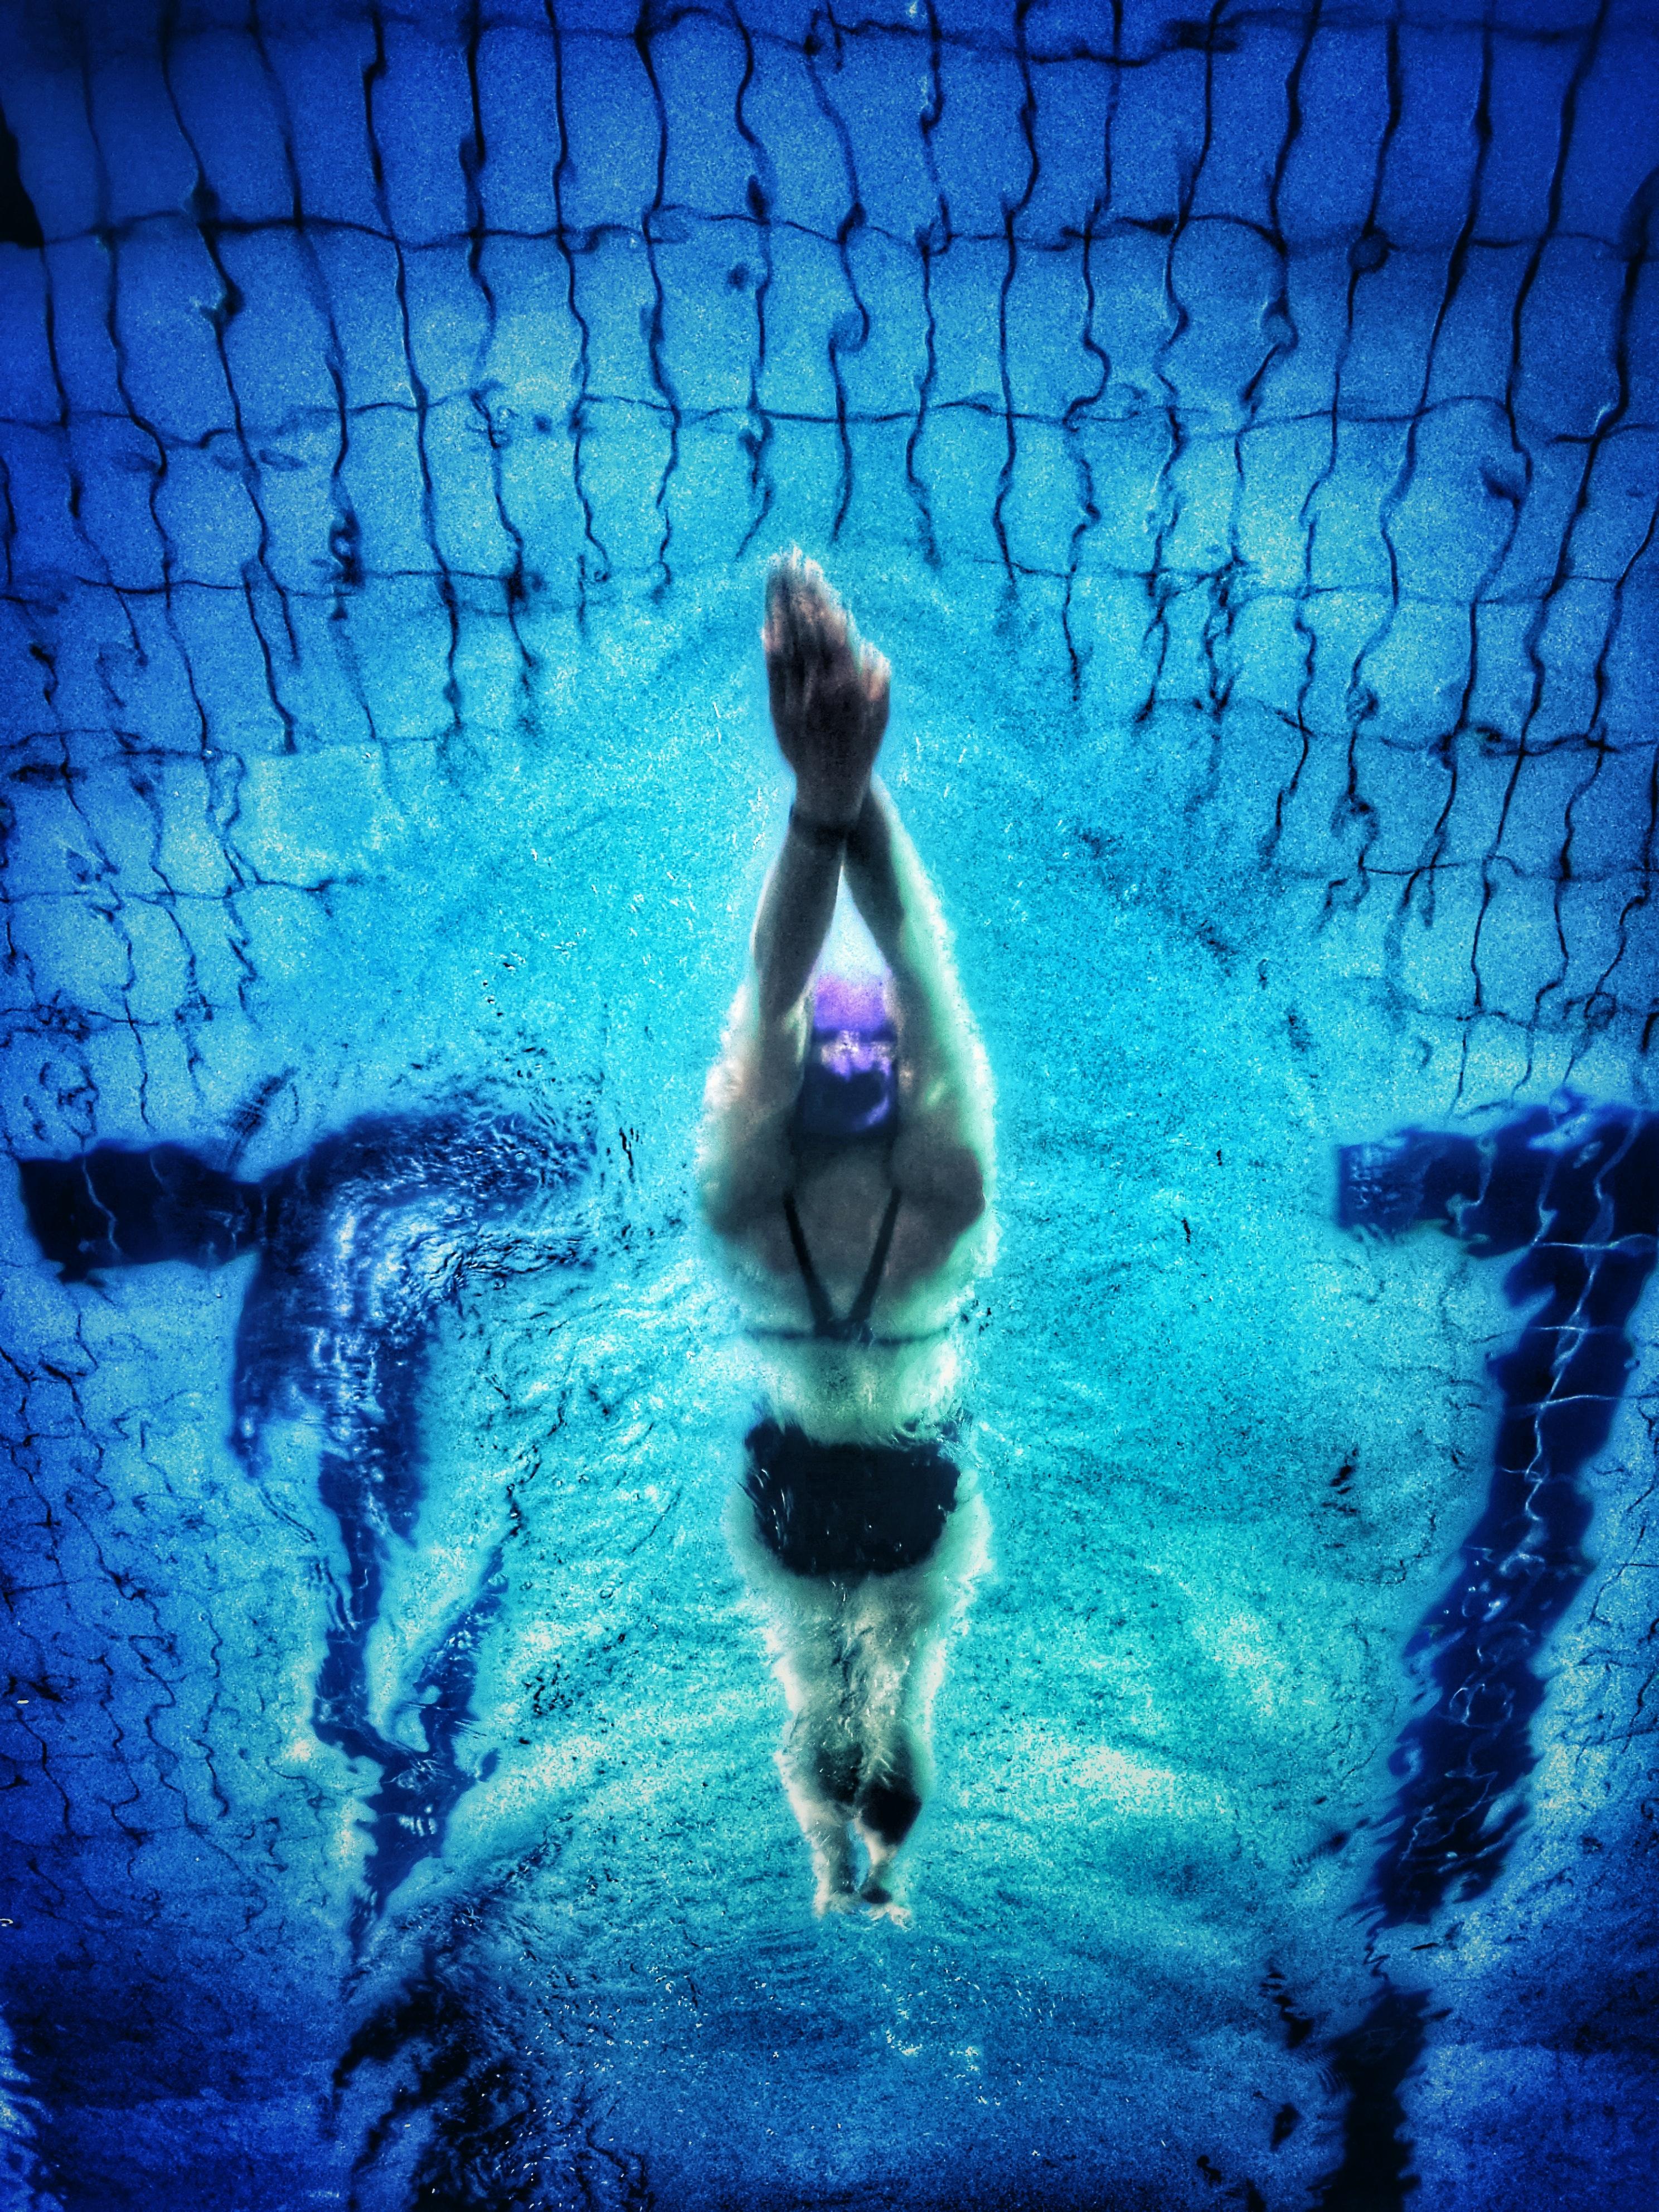 500 Amazing Swimming Pool Photos Pexels Free Stock Photos